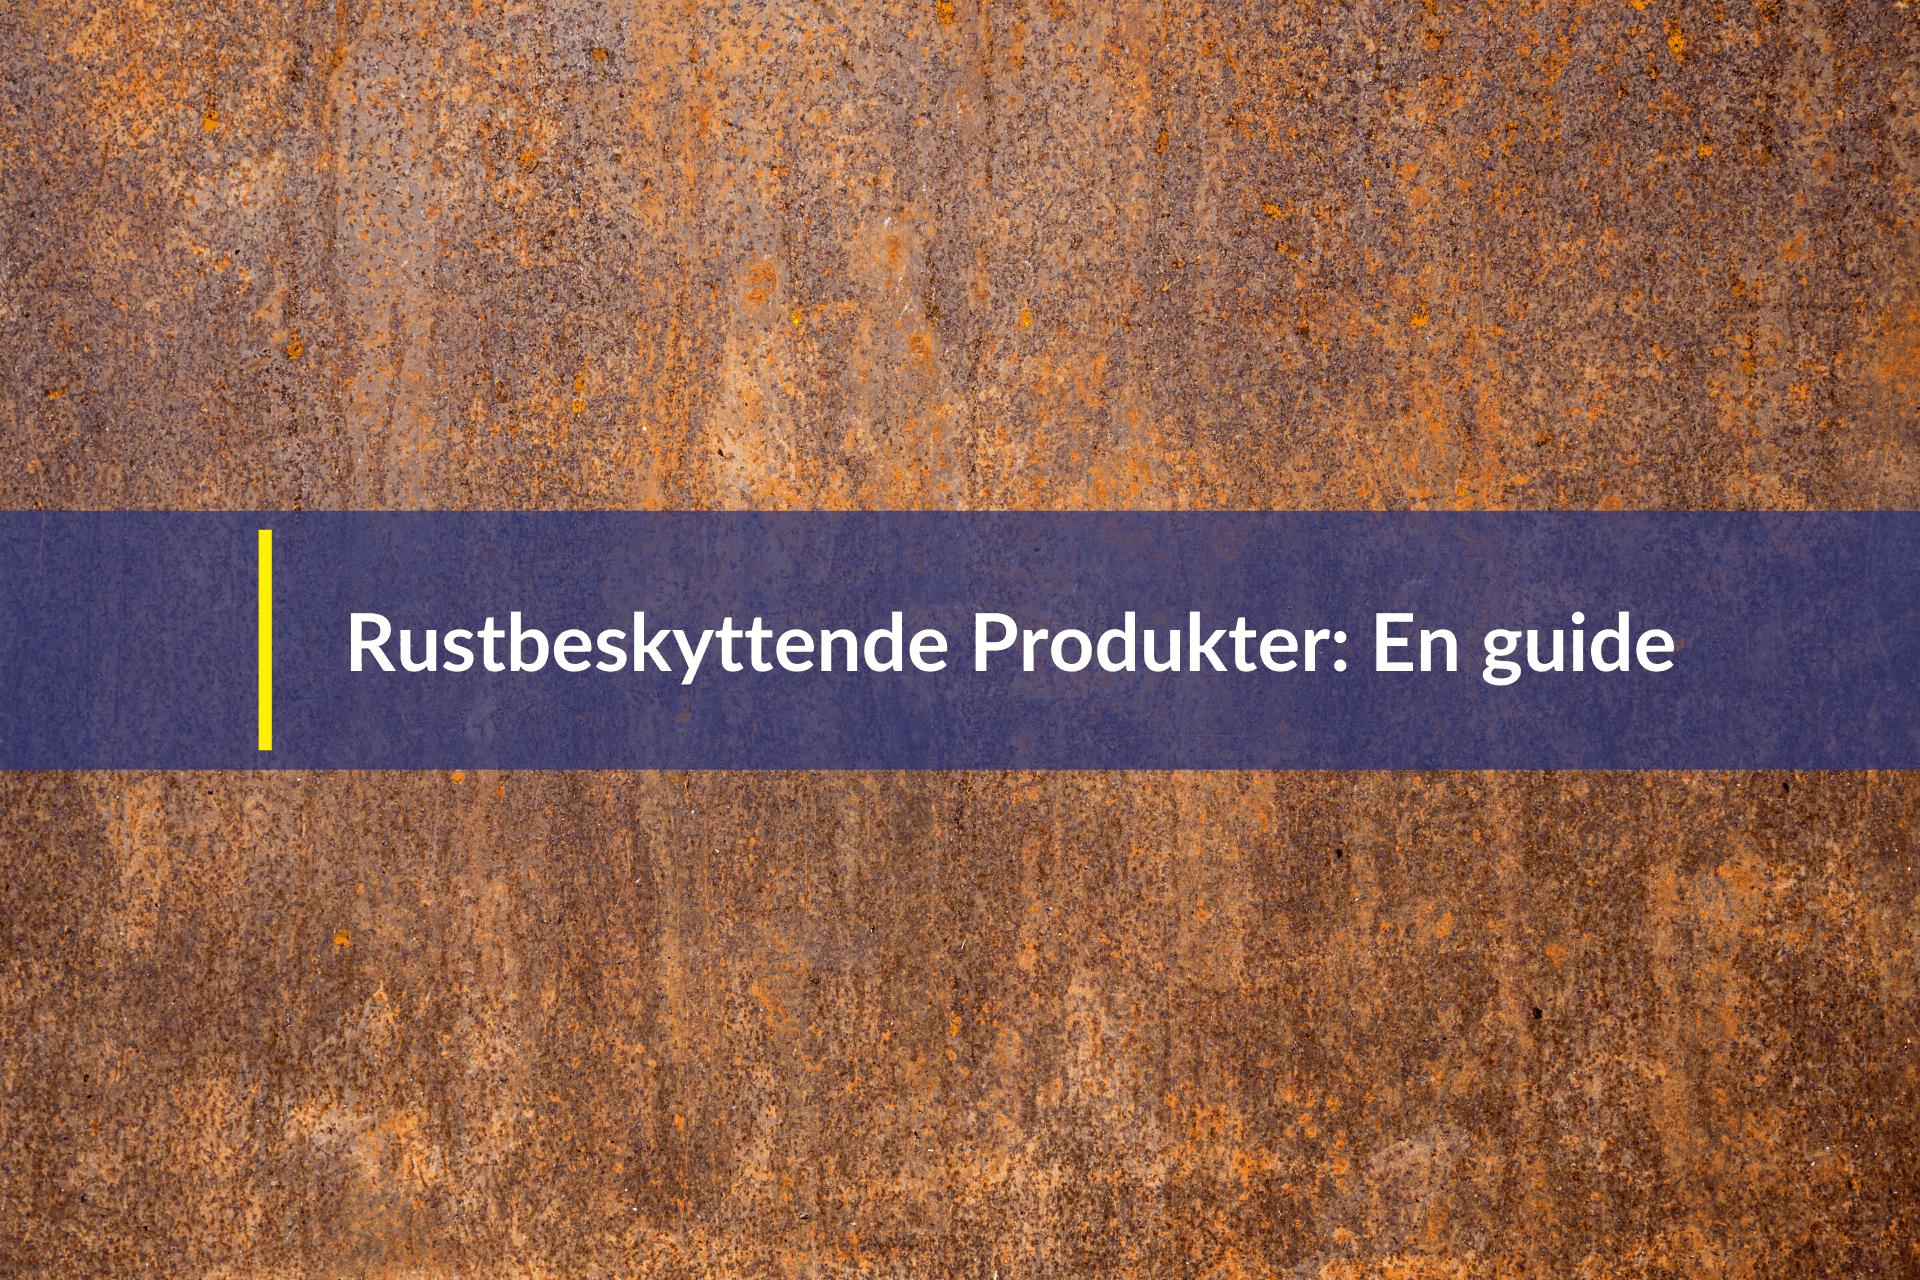 rustbeskyttende produkter en guide